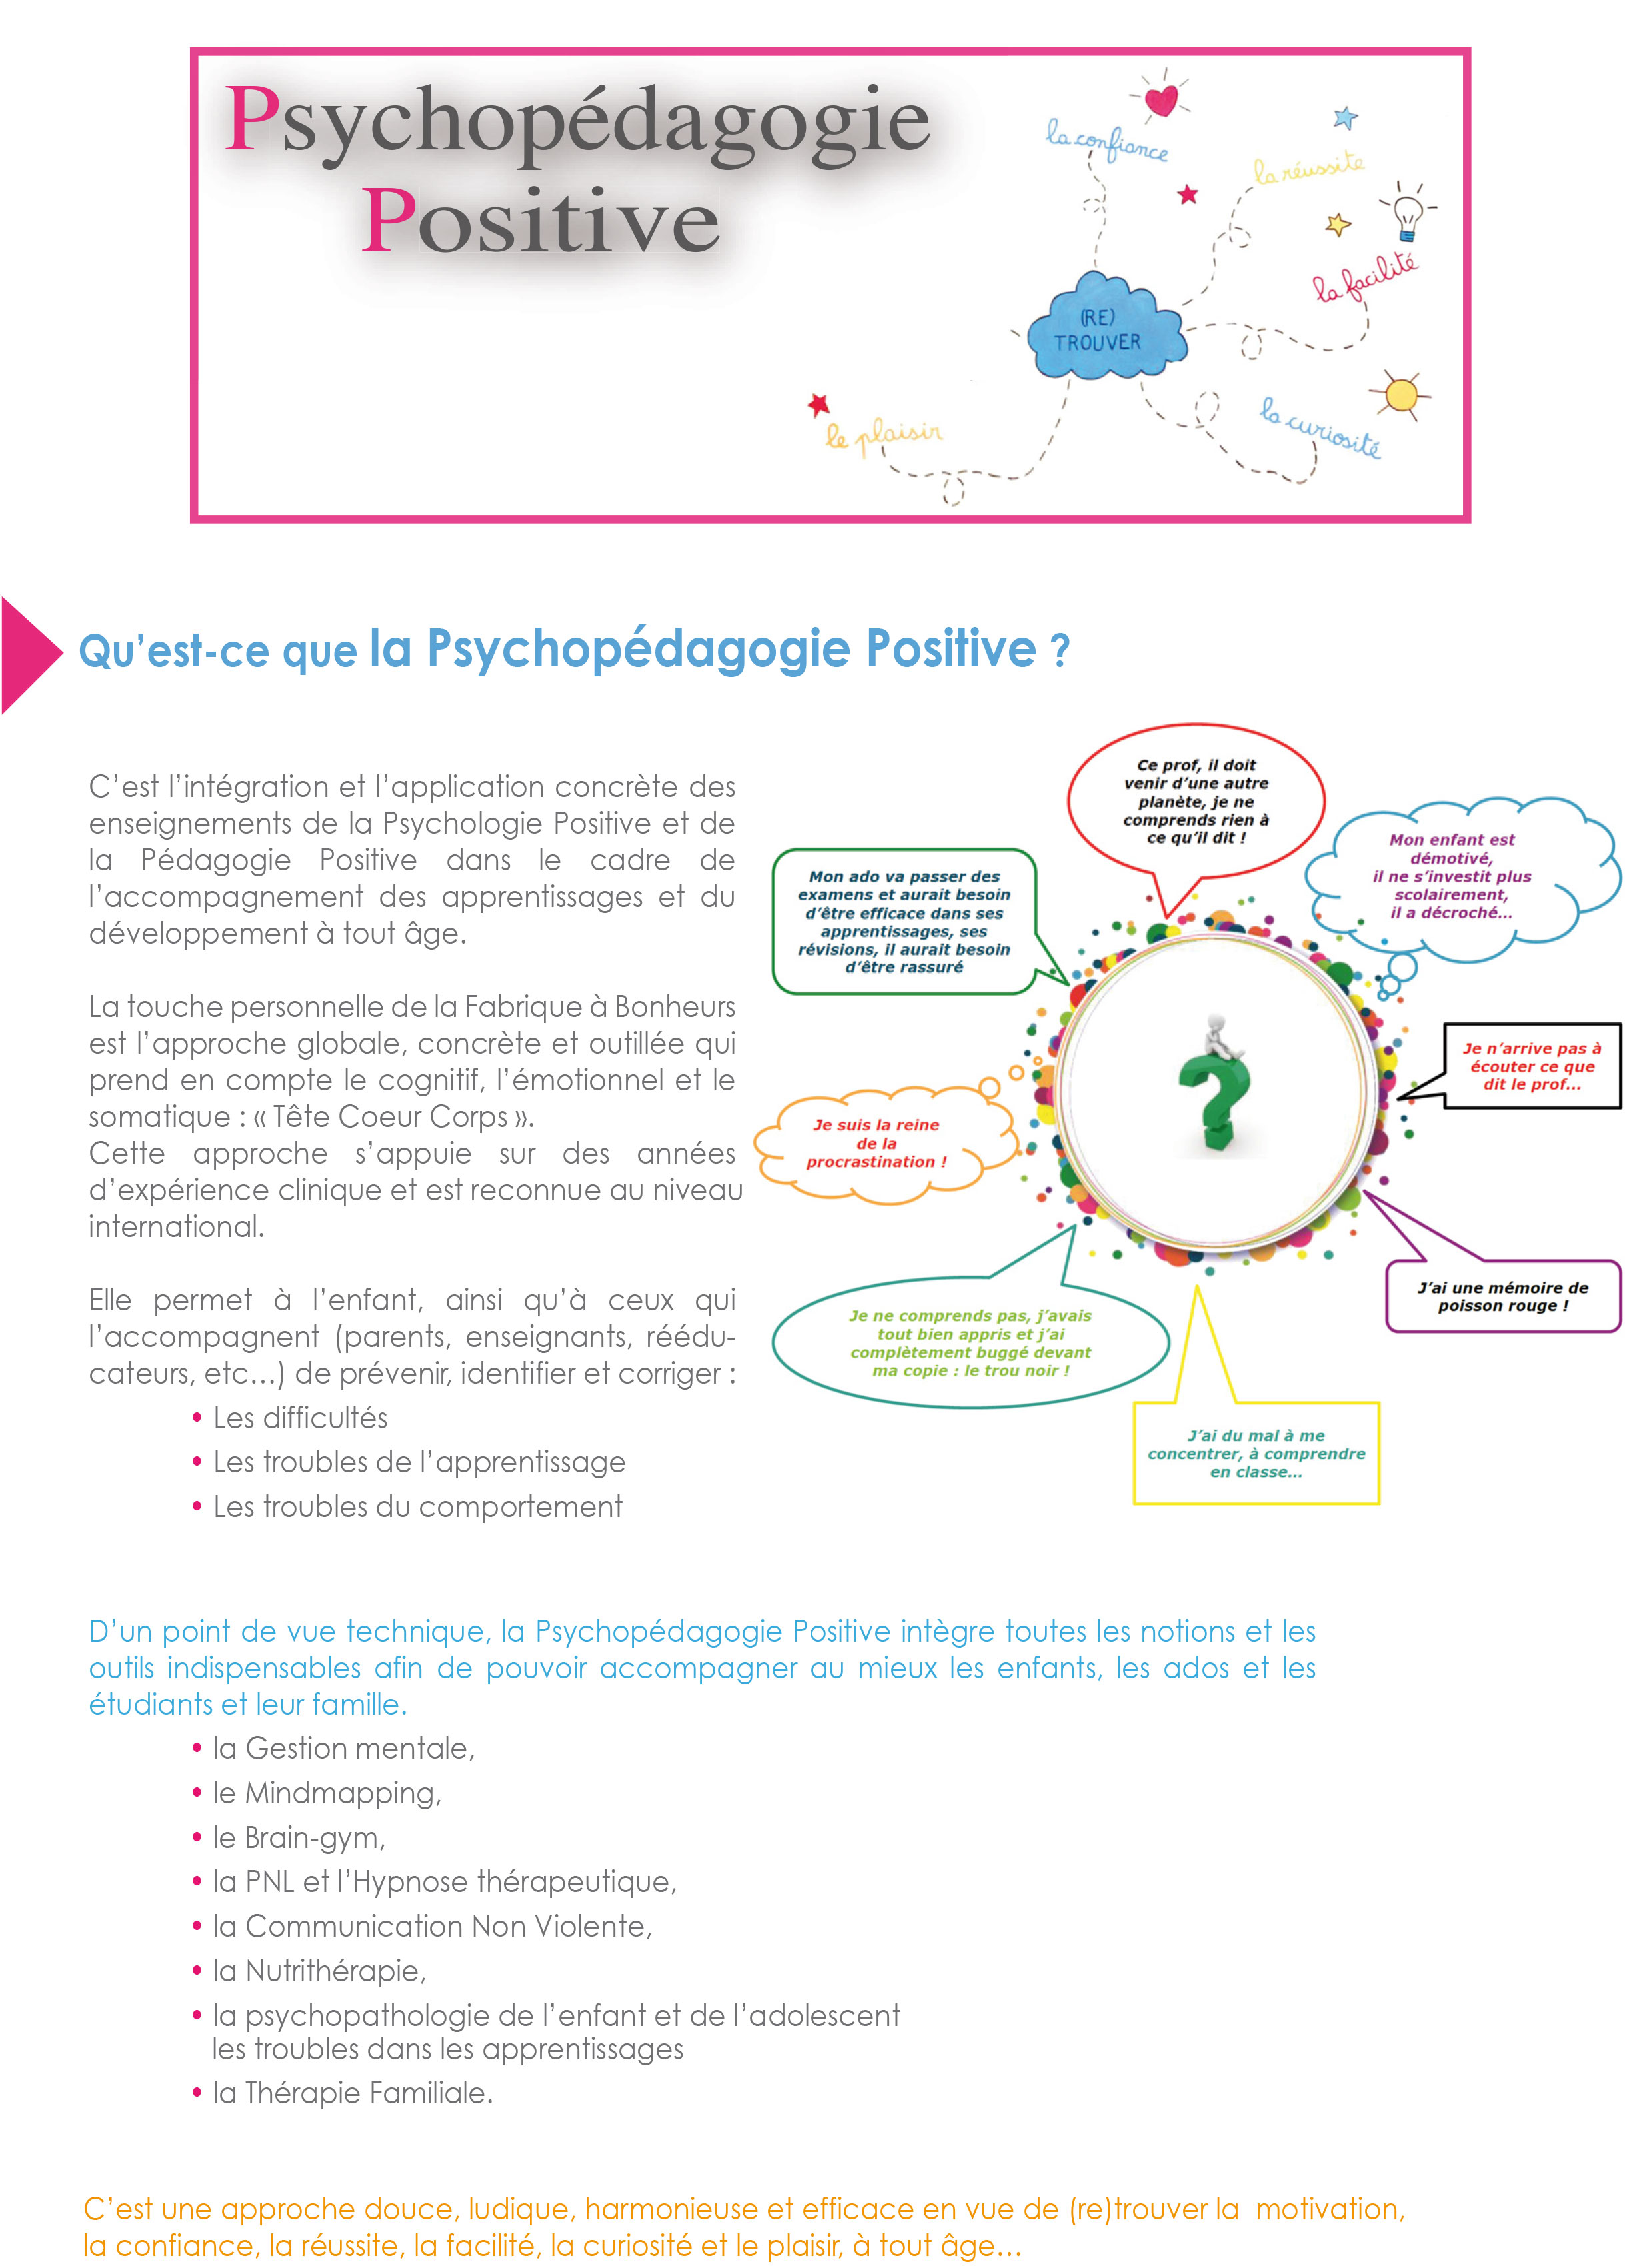 psychopedagogie positive